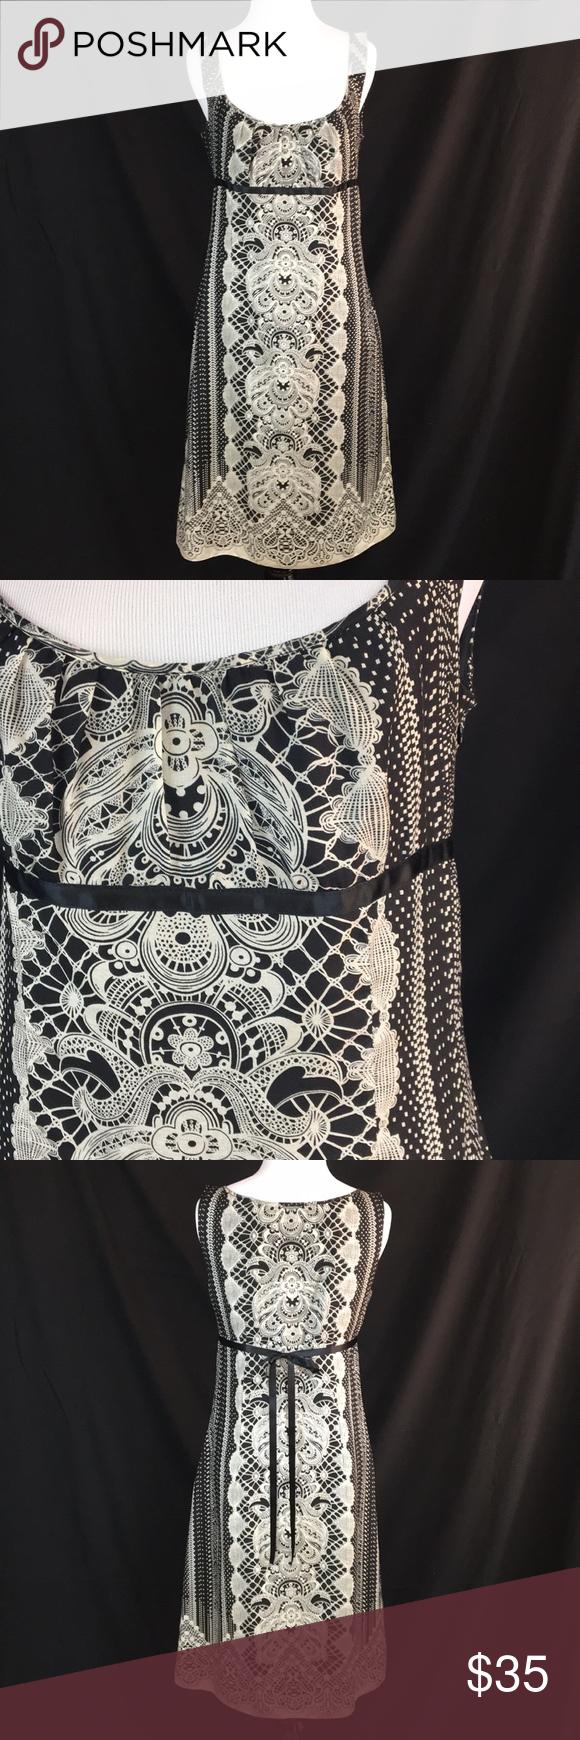 a61441c05d0 Antonio Melani Black Ivory print dress size 6 Antonio Melani Black Ivory  print dress size 6 in excellent used condition. Dress is silk  cotton.